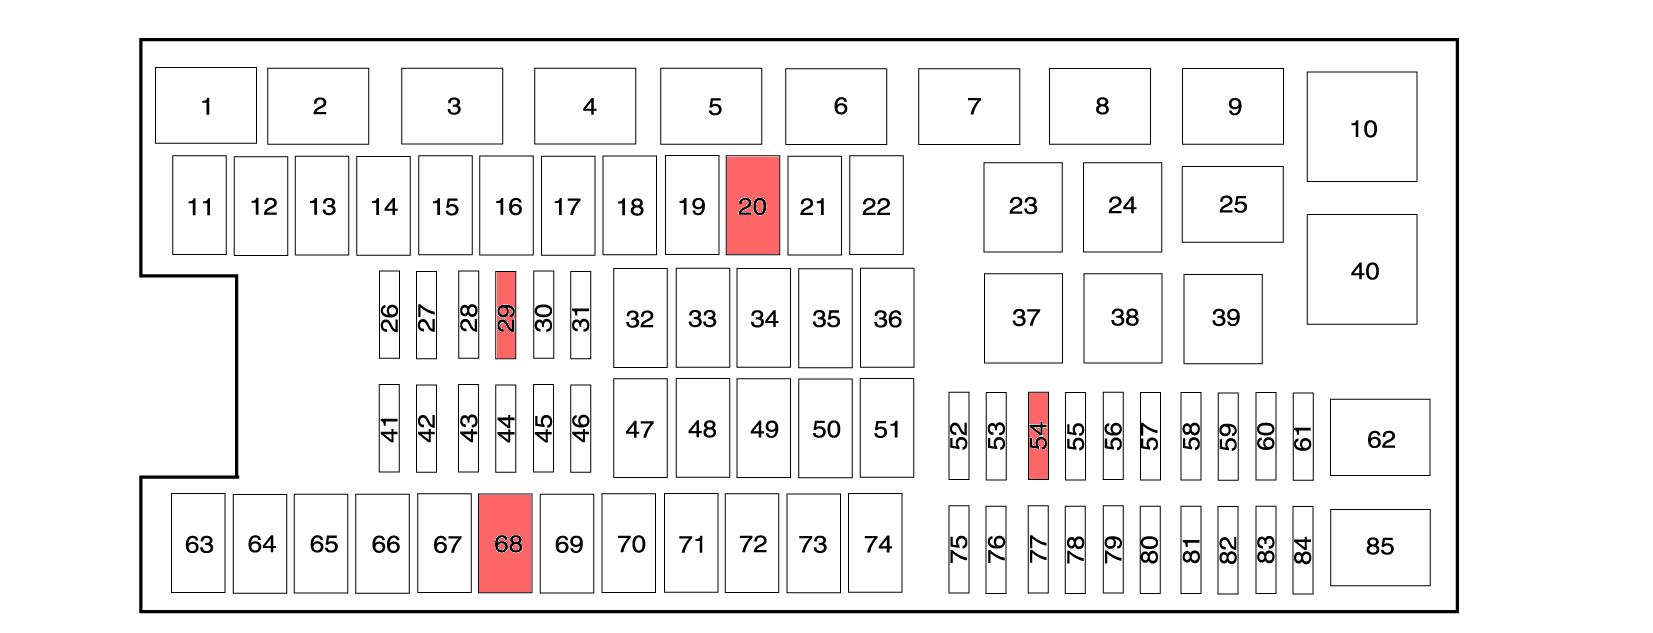 2000 daewoo leganza fuse box diagram mitsubishi montero